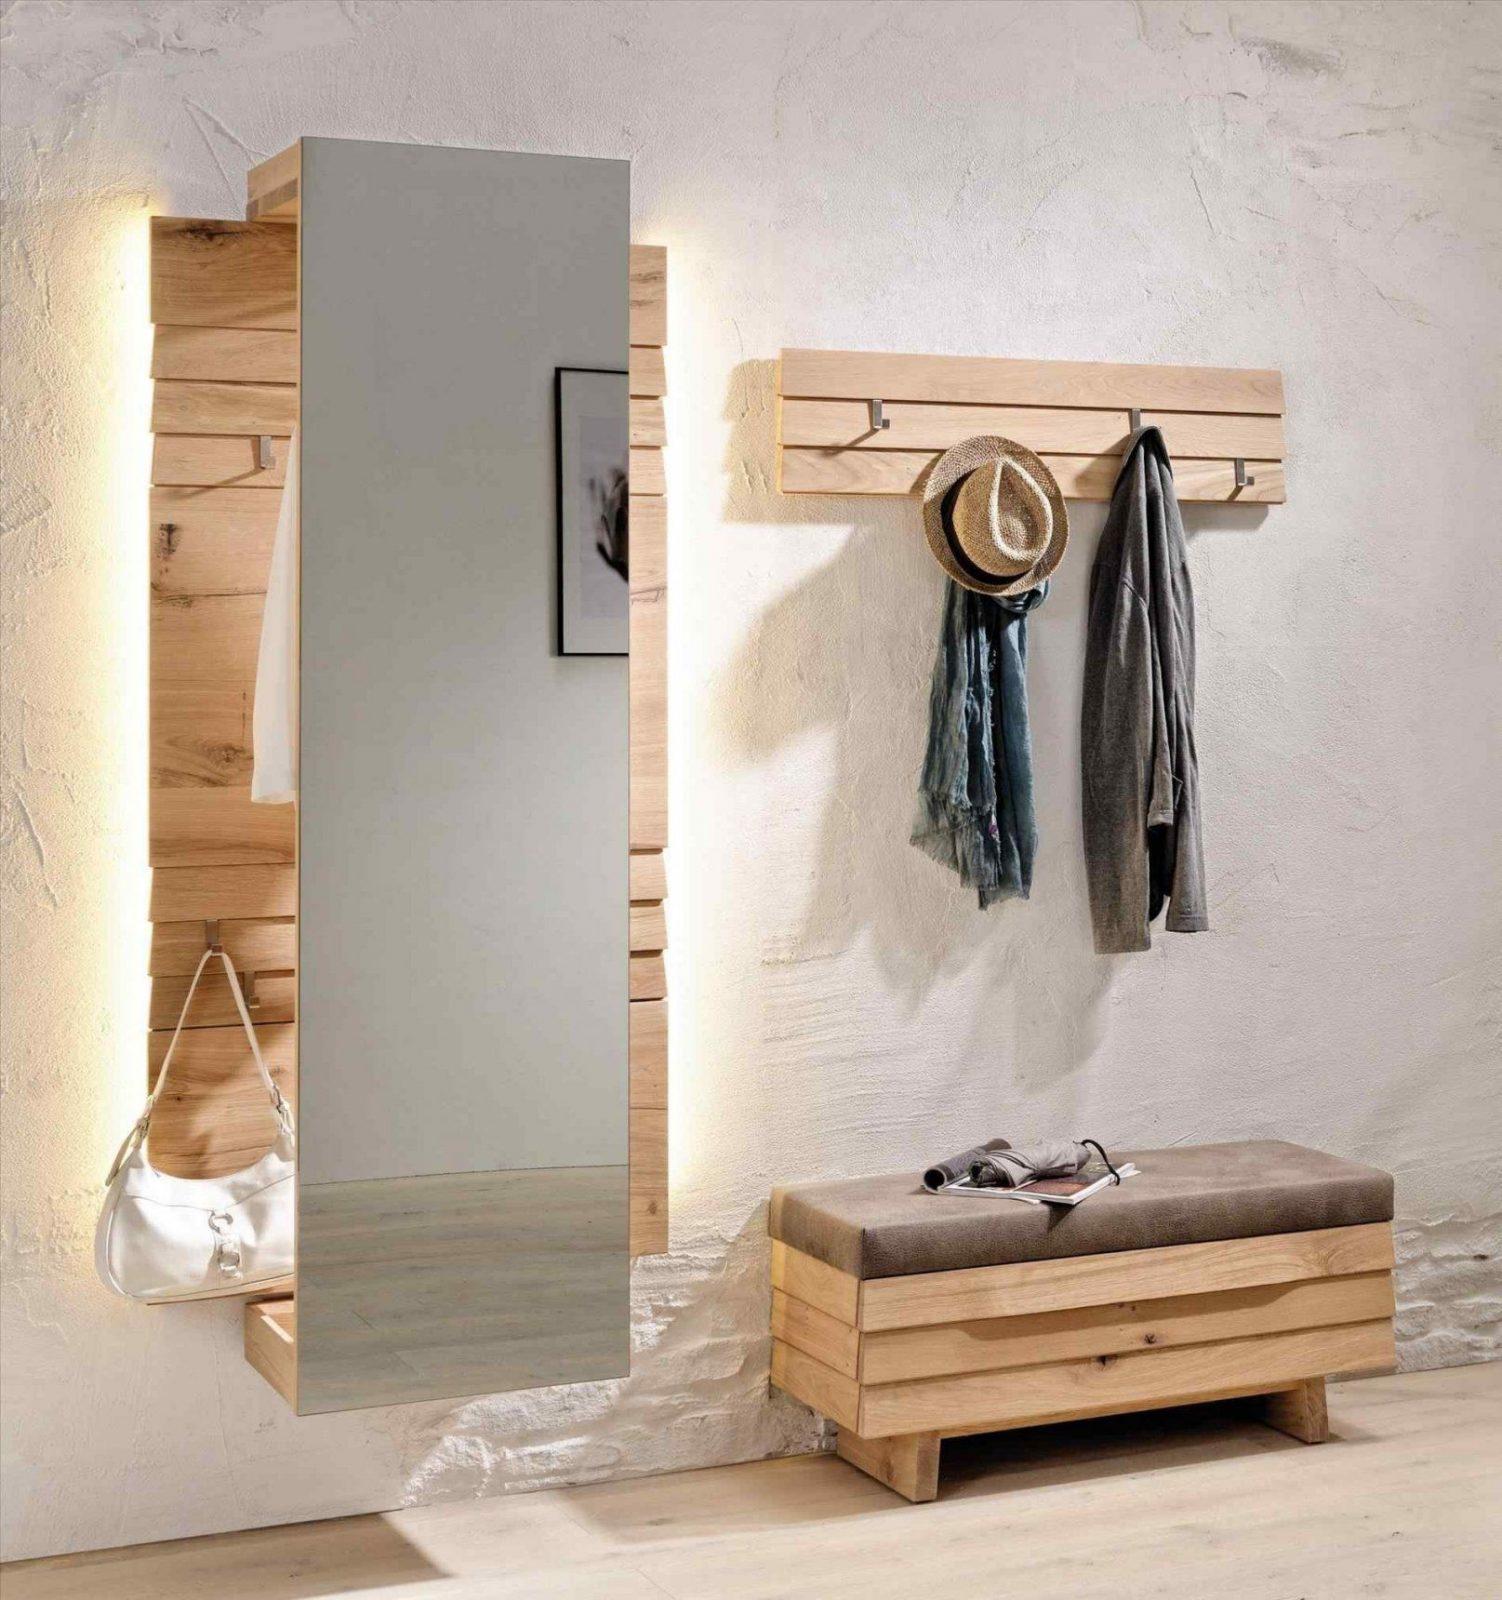 Inspirational Garderobe Holz Selber Bauen Elegant Garderobe Aus Sten von Holz Garderobe Selber Machen Bild